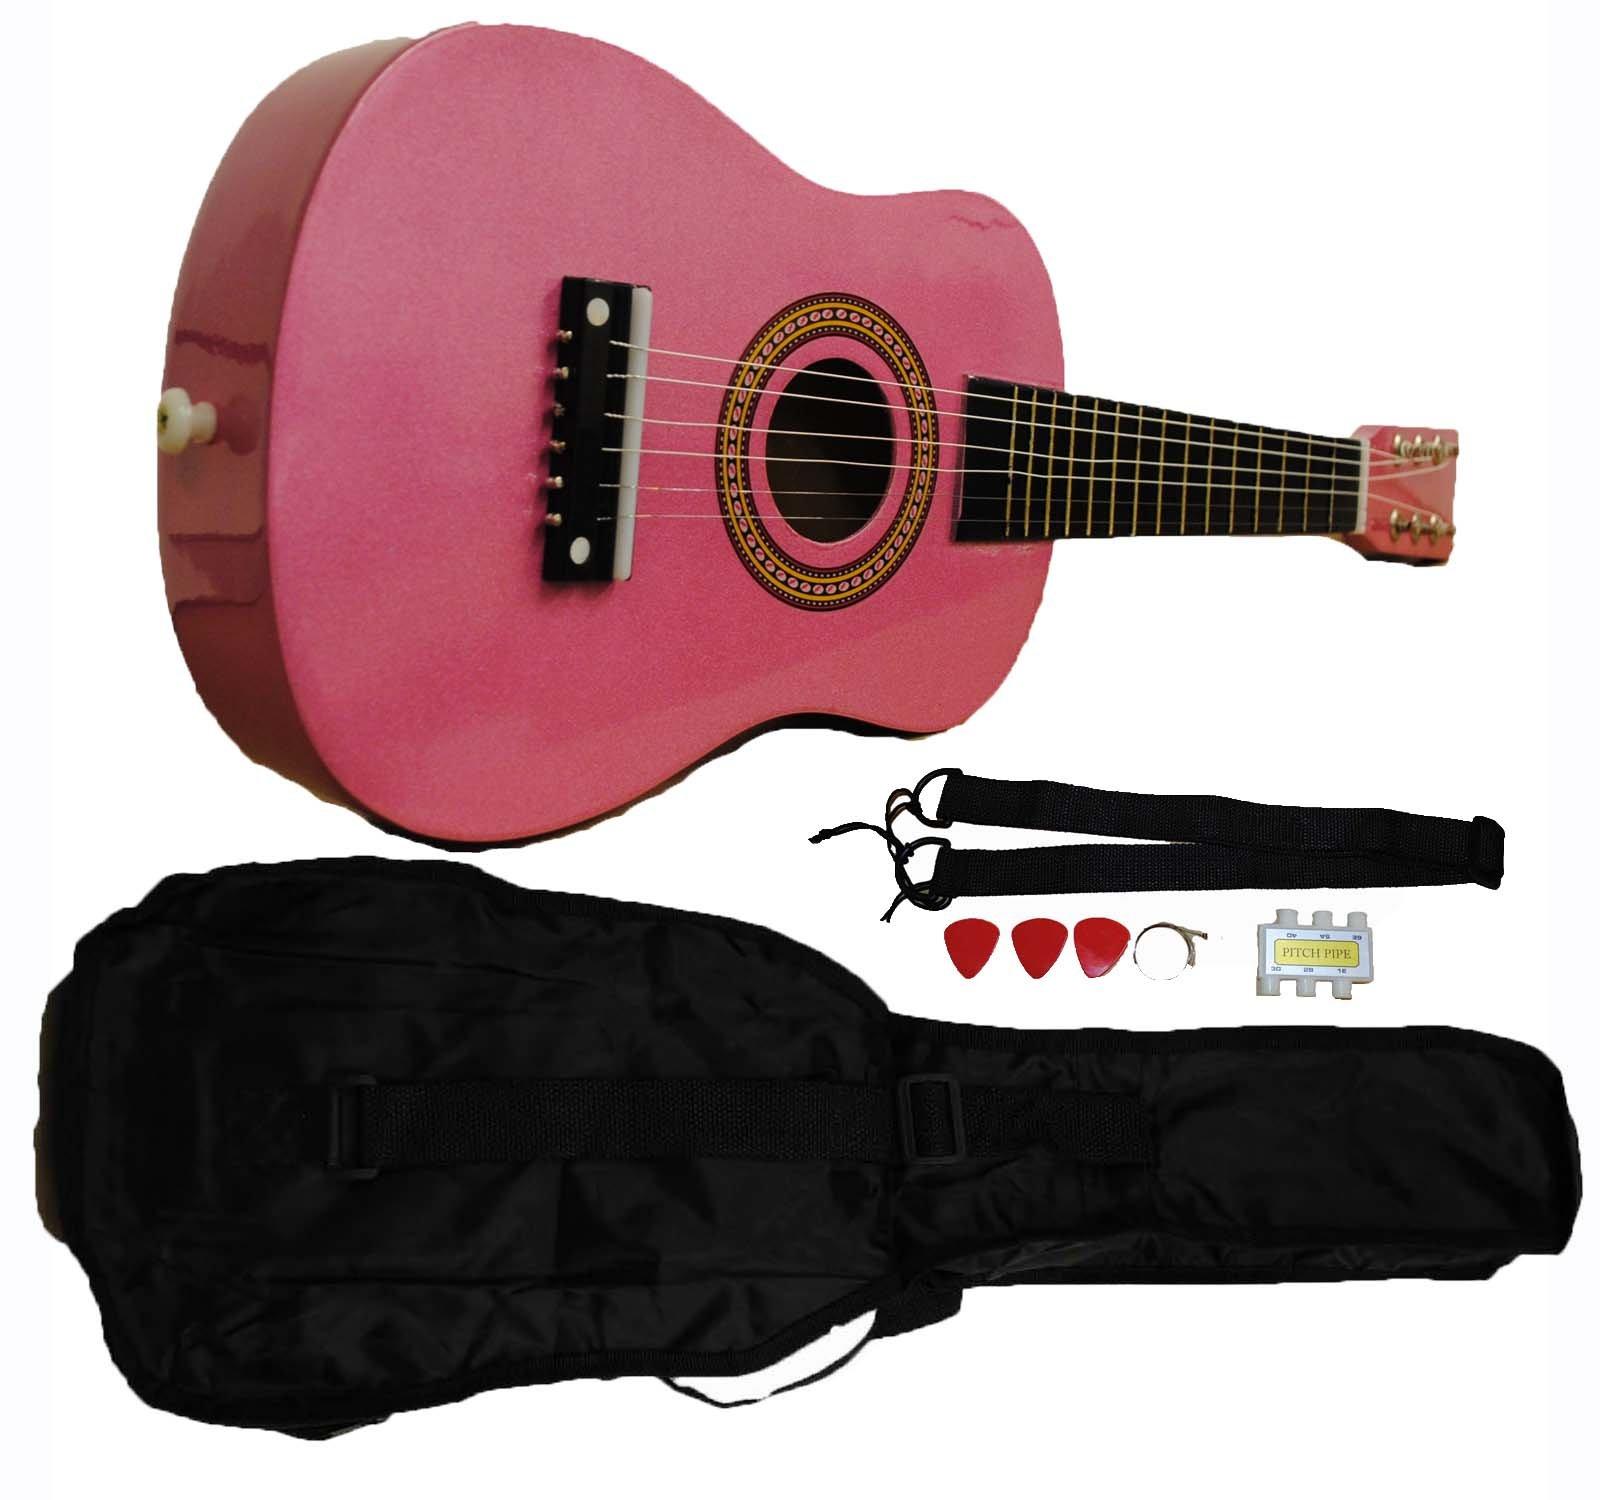 Mini Kids Acoustic Toy Guitar Kit Gig Bag + Picks + Strap + Tuner - Glitter Pink